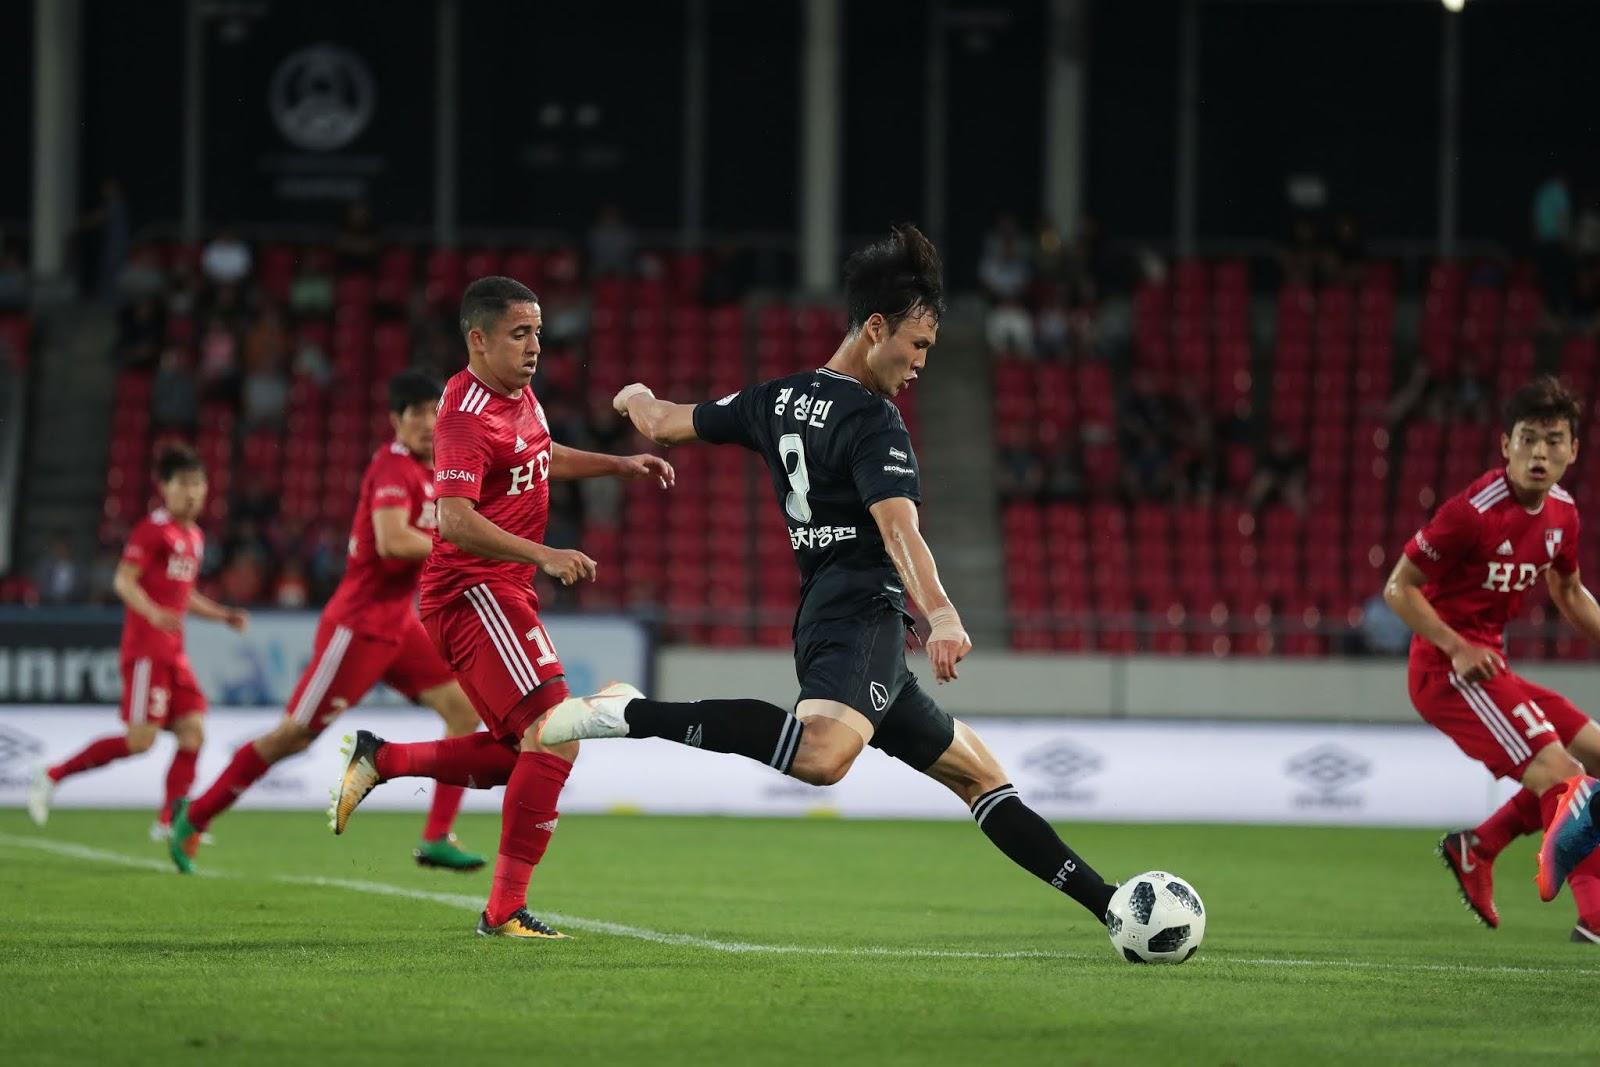 Preview: Seongnam FC vs Busan IPark K League 2